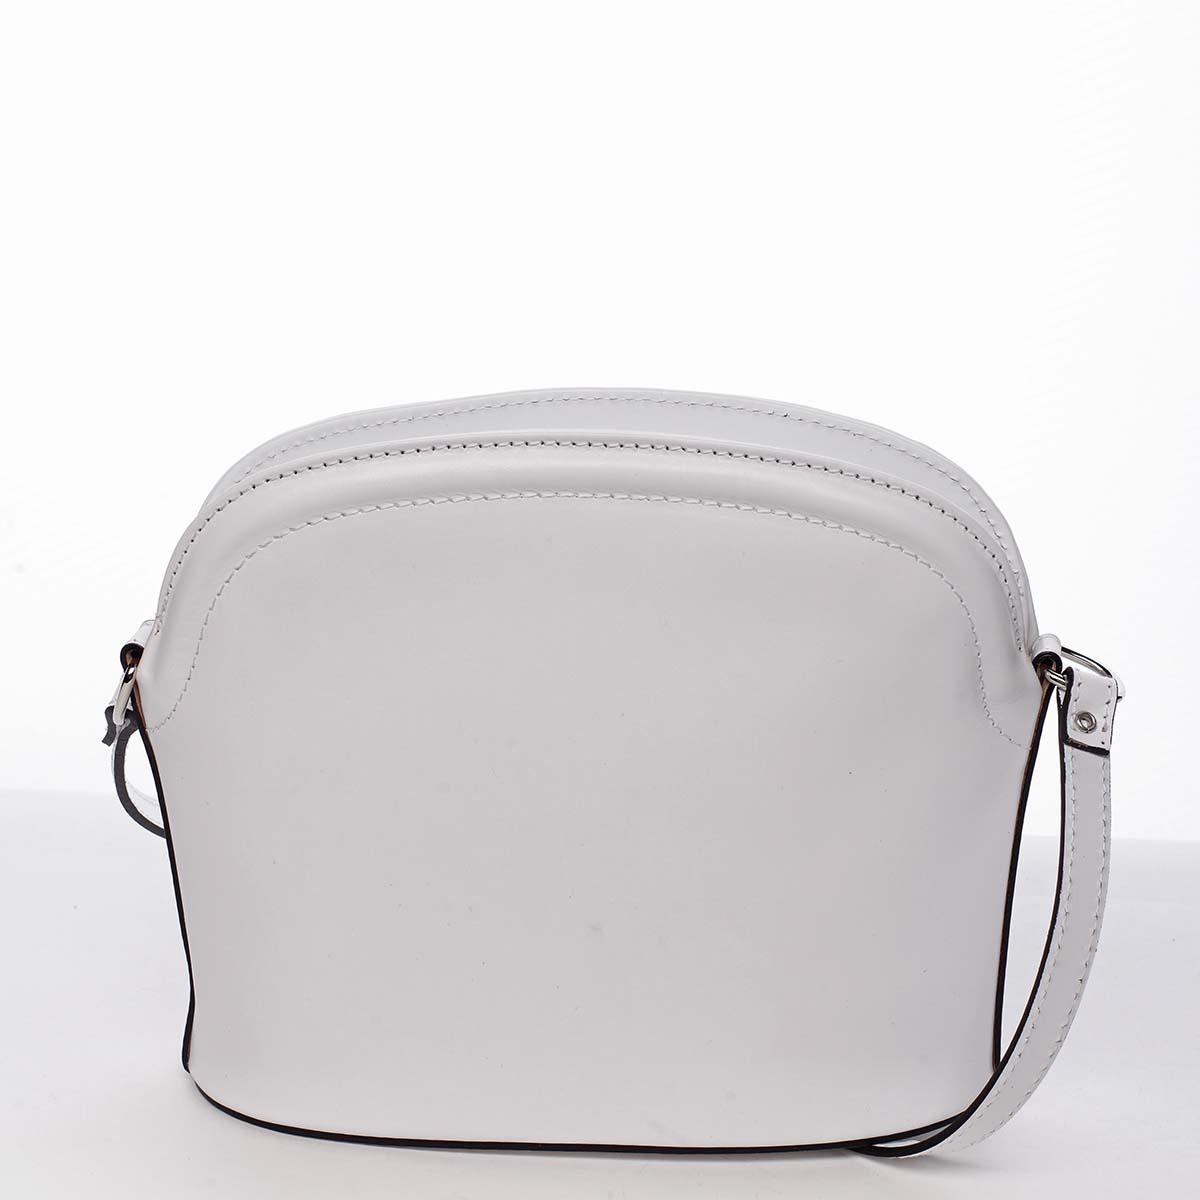 Dámská kožená crossbody kabelka bílá - ItalY Tracy